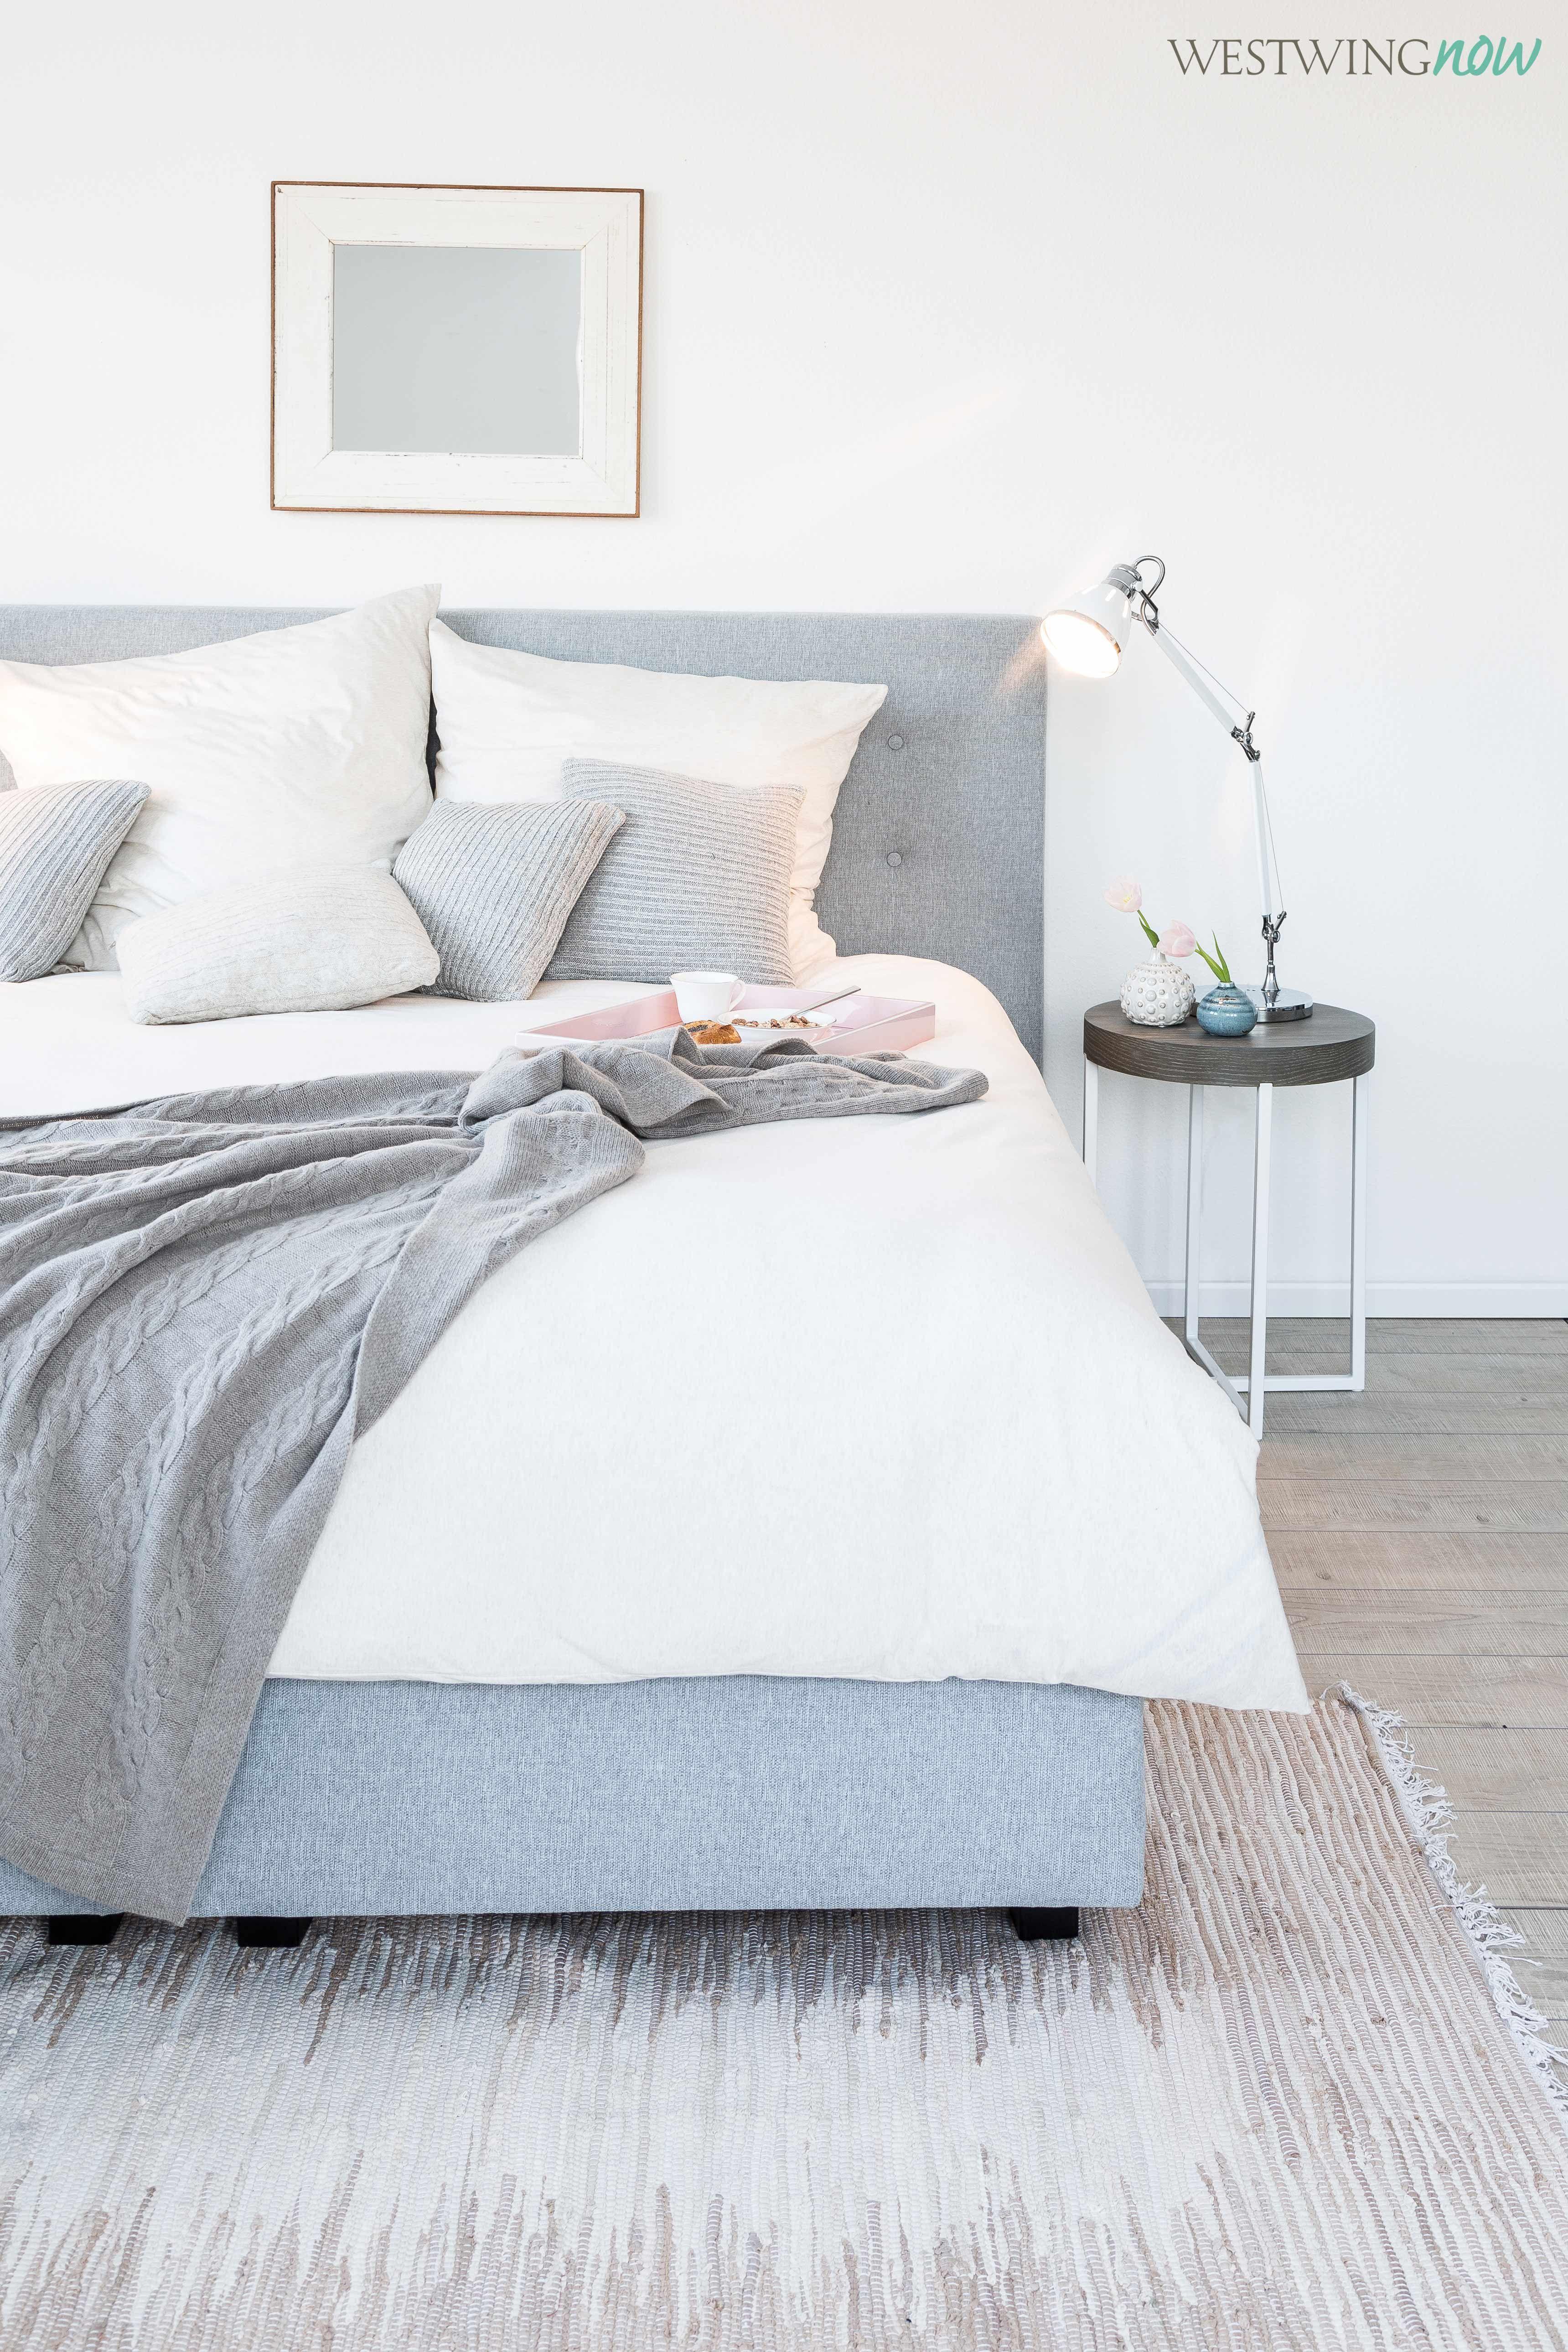 Strick macht Betten heimelig! Der Clou an den Kissen Sie